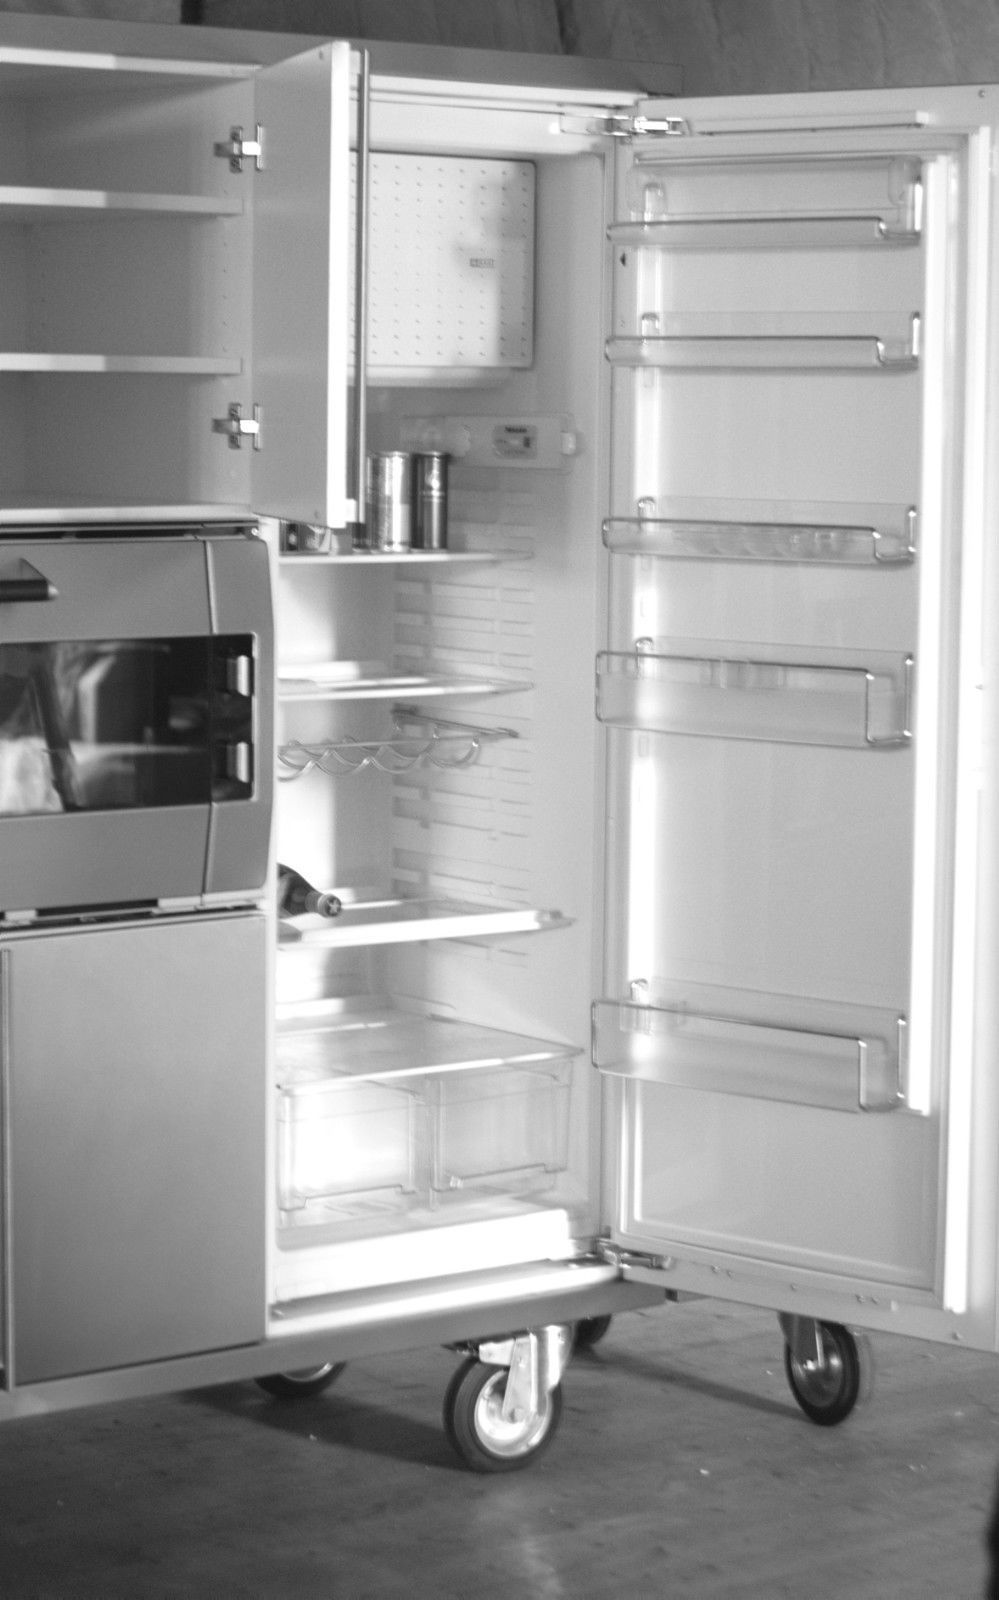 k chenmodule bulthaup system 20 edelstahl gaggenau miele einzelanfertigungen ebay k che. Black Bedroom Furniture Sets. Home Design Ideas